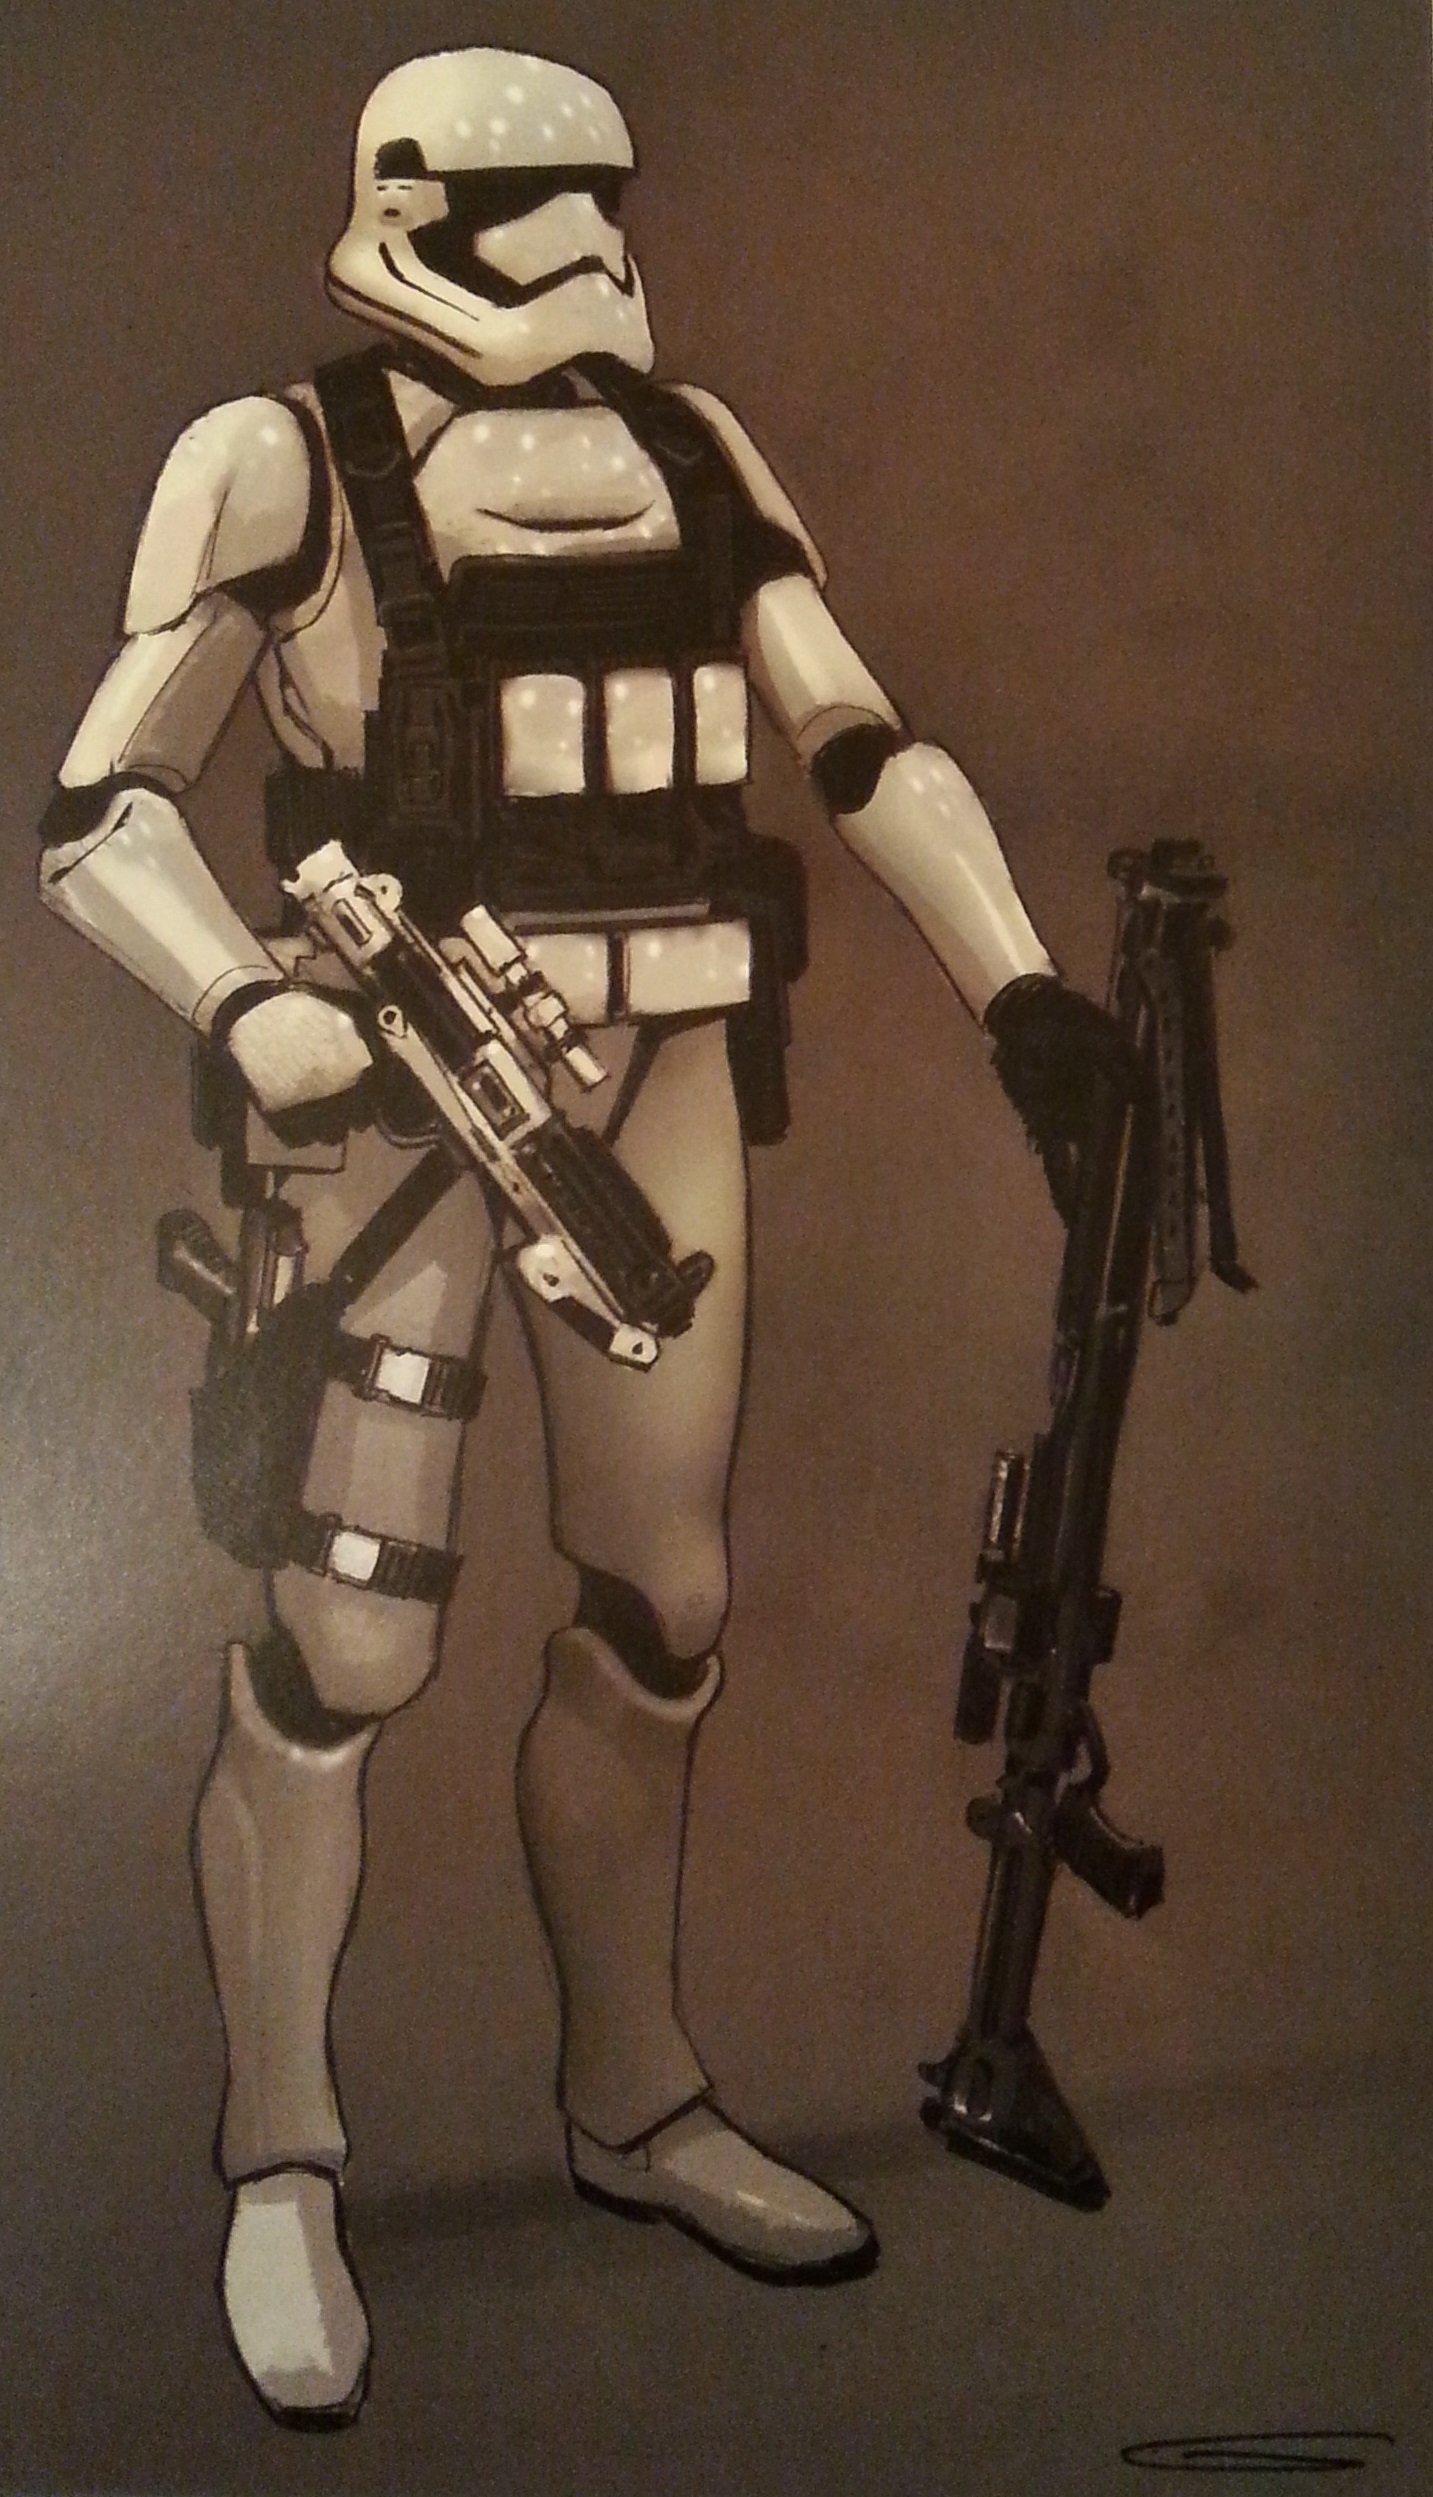 09-13 Stormtrooper Final Design